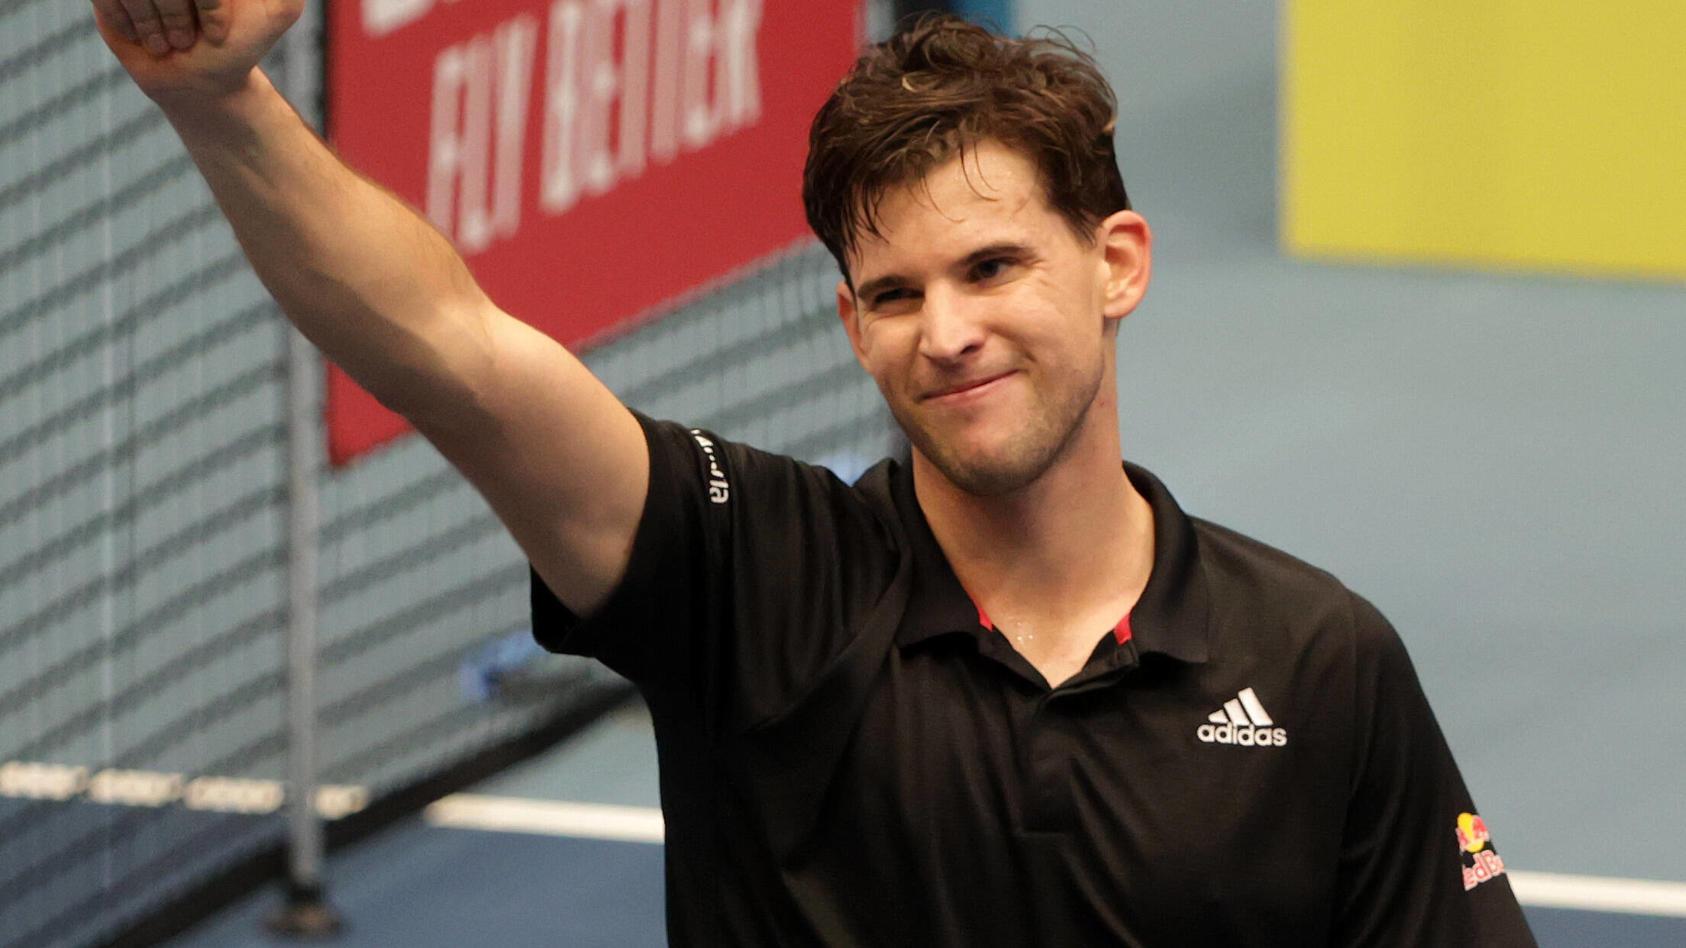 Tennis-Profi Dominic Thiem soll Lili Paul-Roncalli daten.